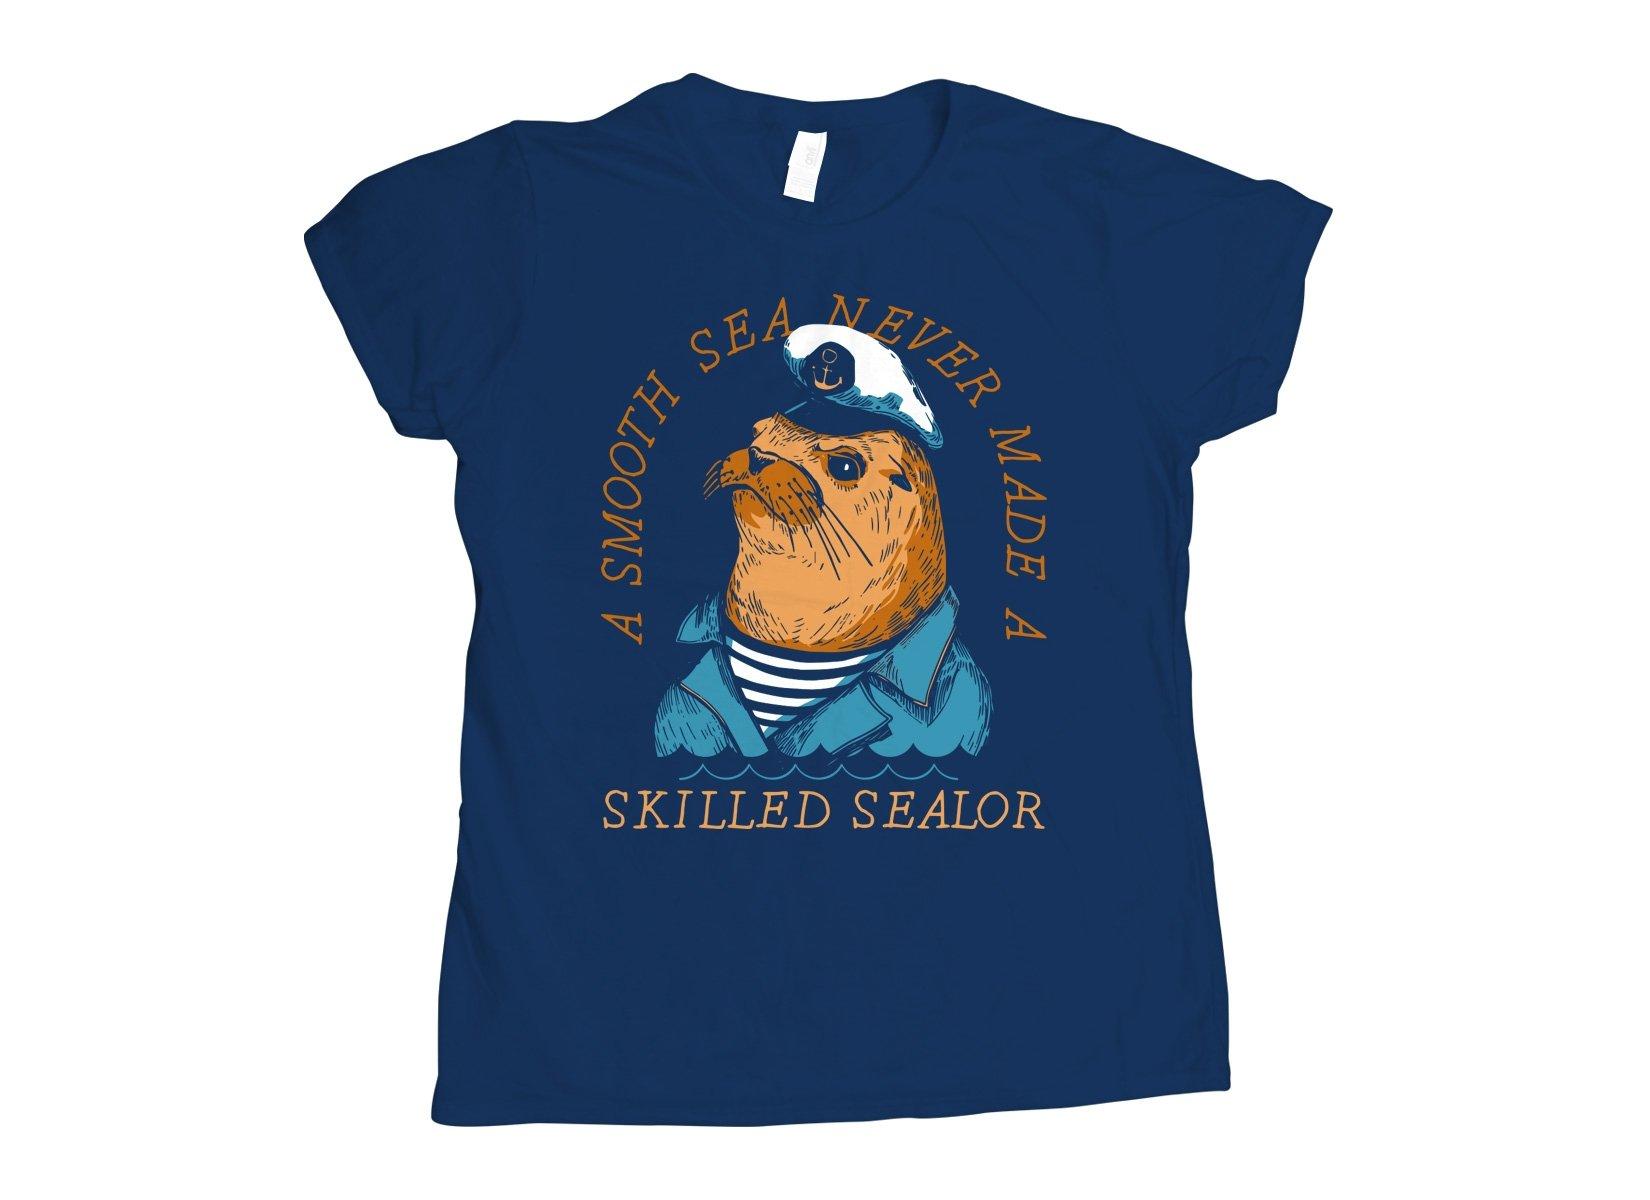 Skilled Sealor on Womens T-Shirt